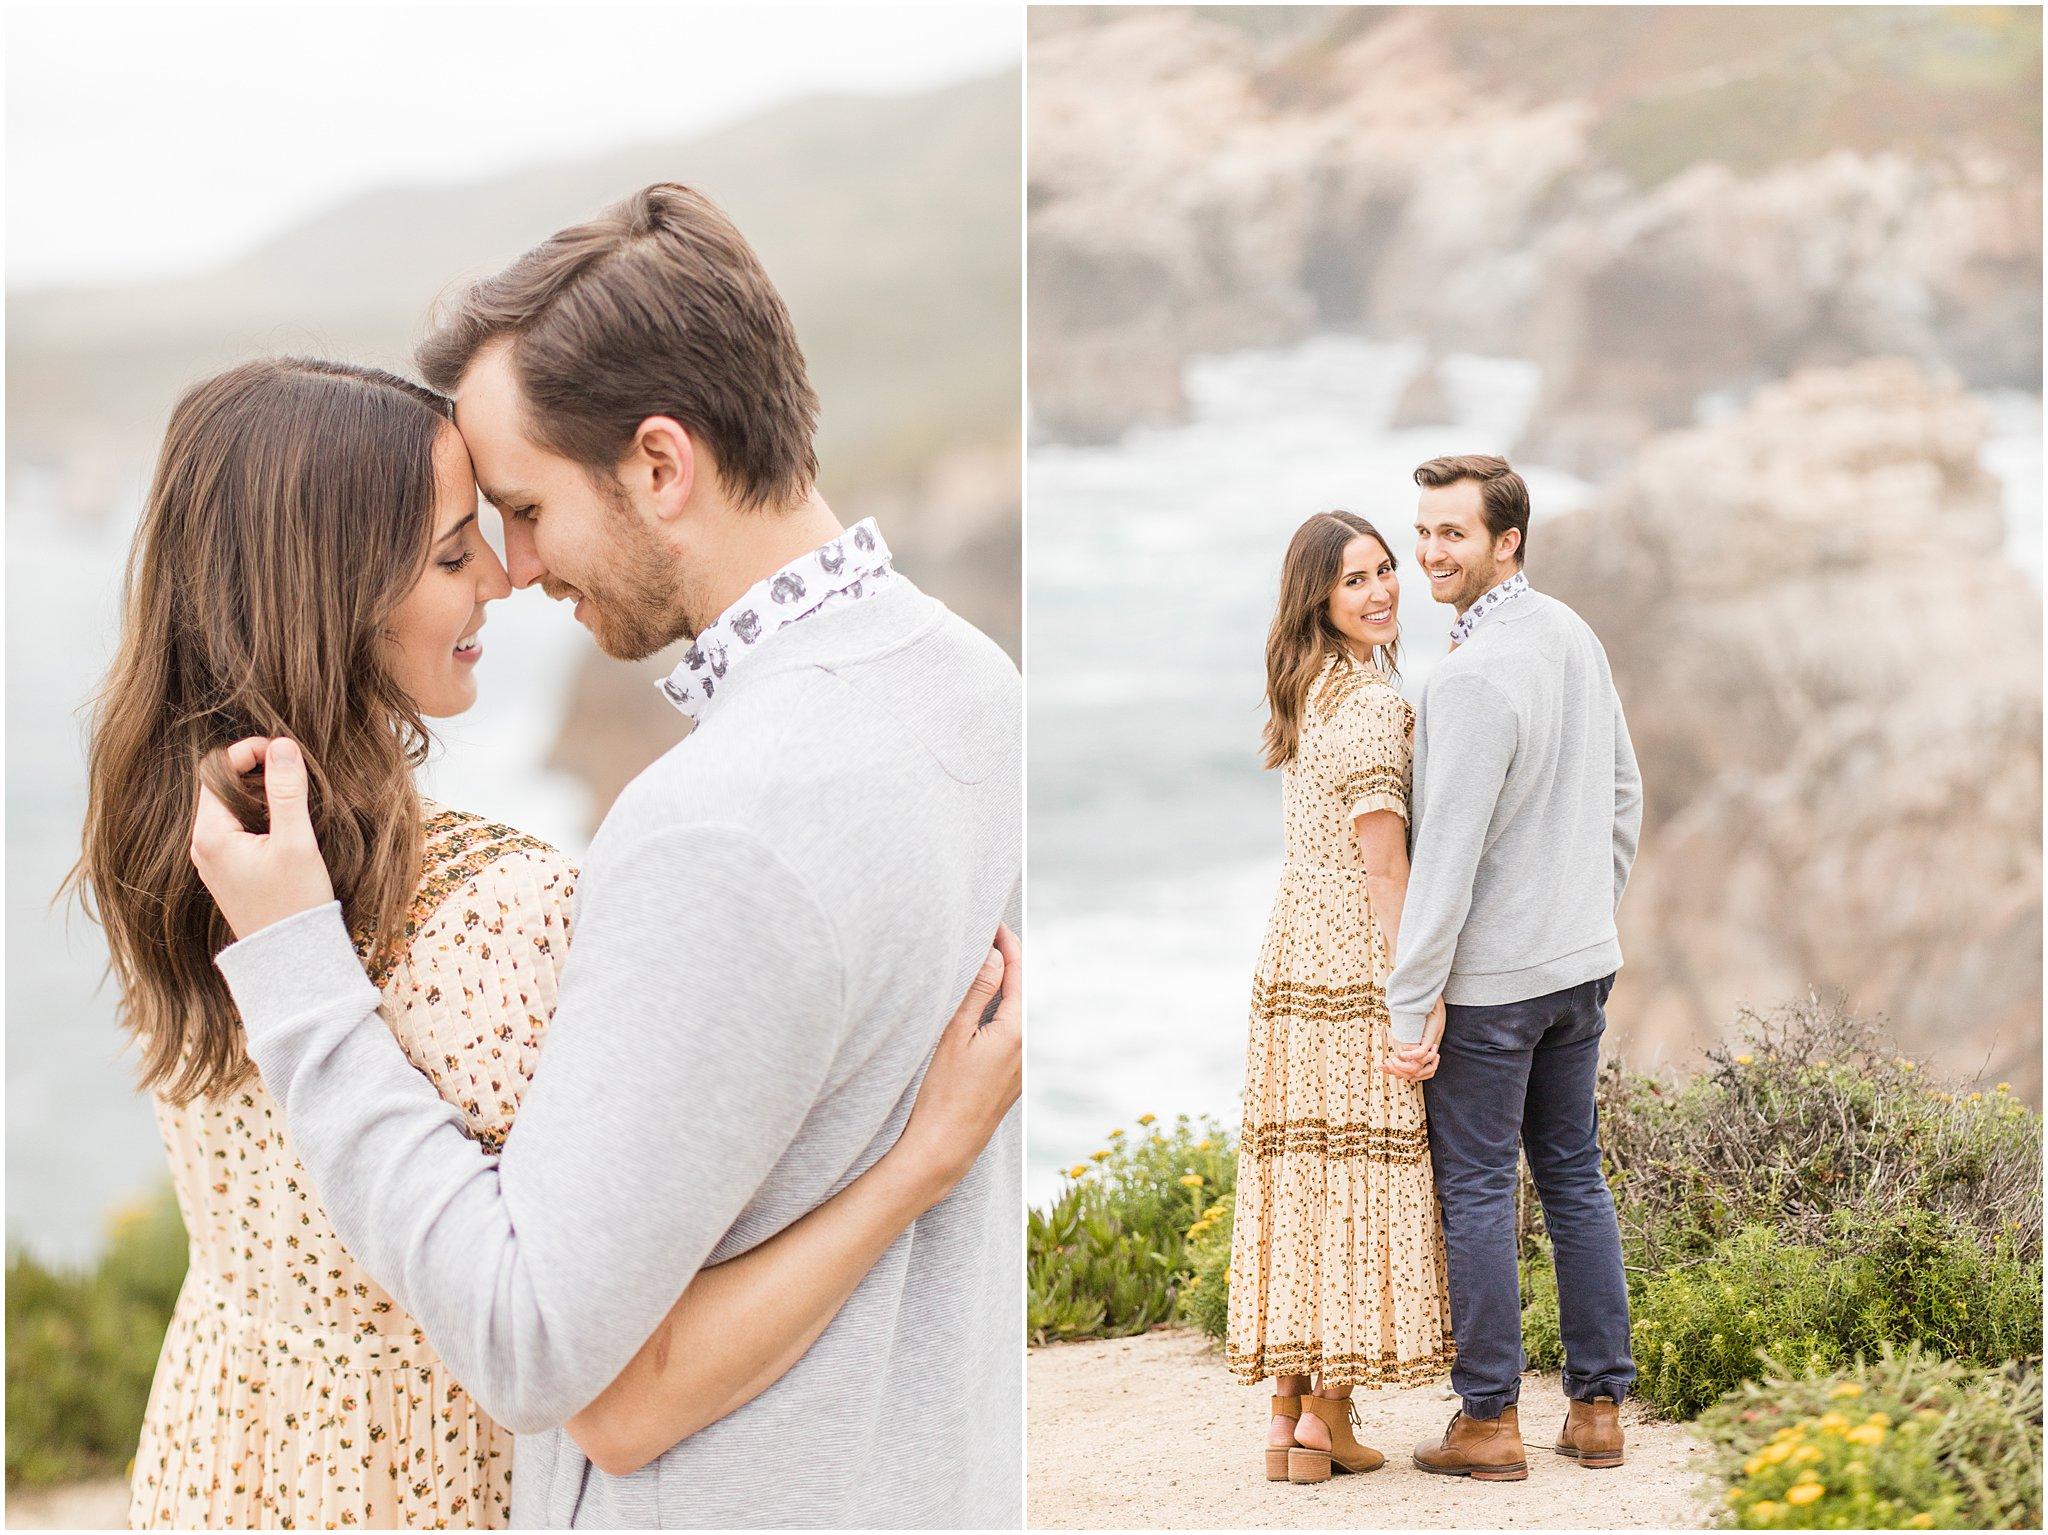 2019 carmel highlands garrapata state park couples portrait session bay area wedding photographer_0012.jpg